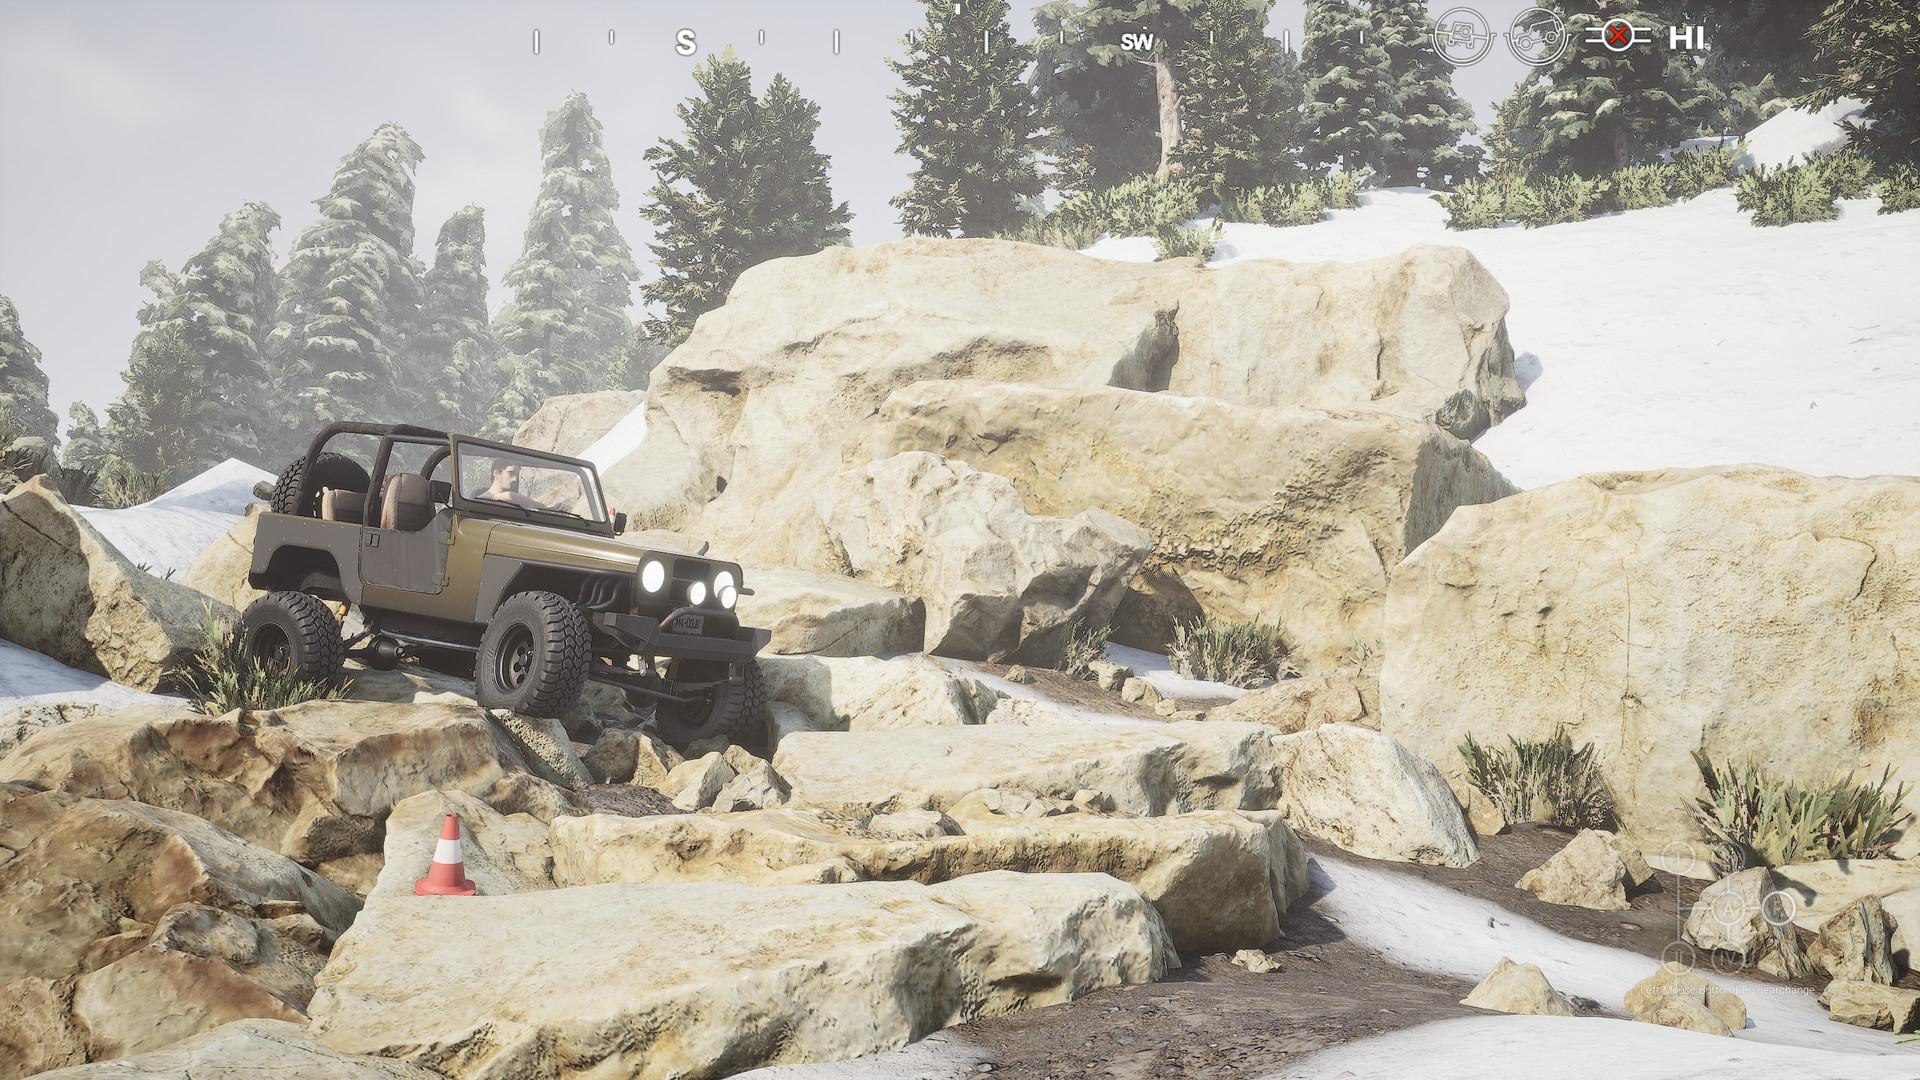 Pure Rock Crawling Fiyat Karşılaştırma